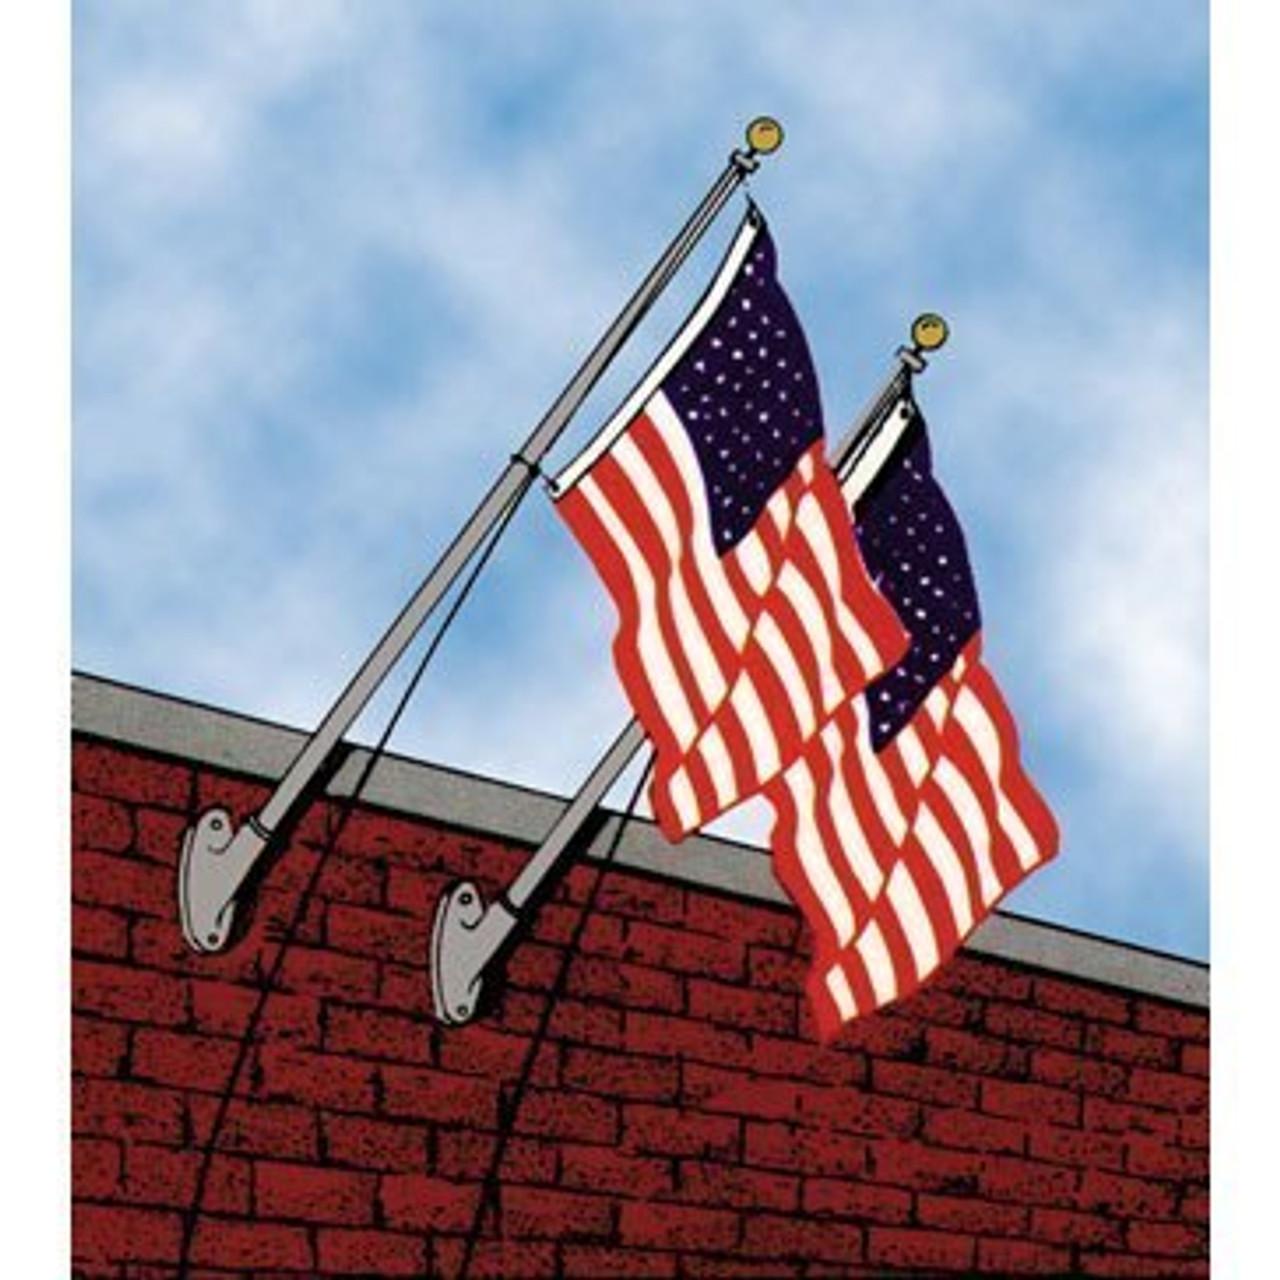 6' Budget Wall Mounted Flagpole (EOA6)